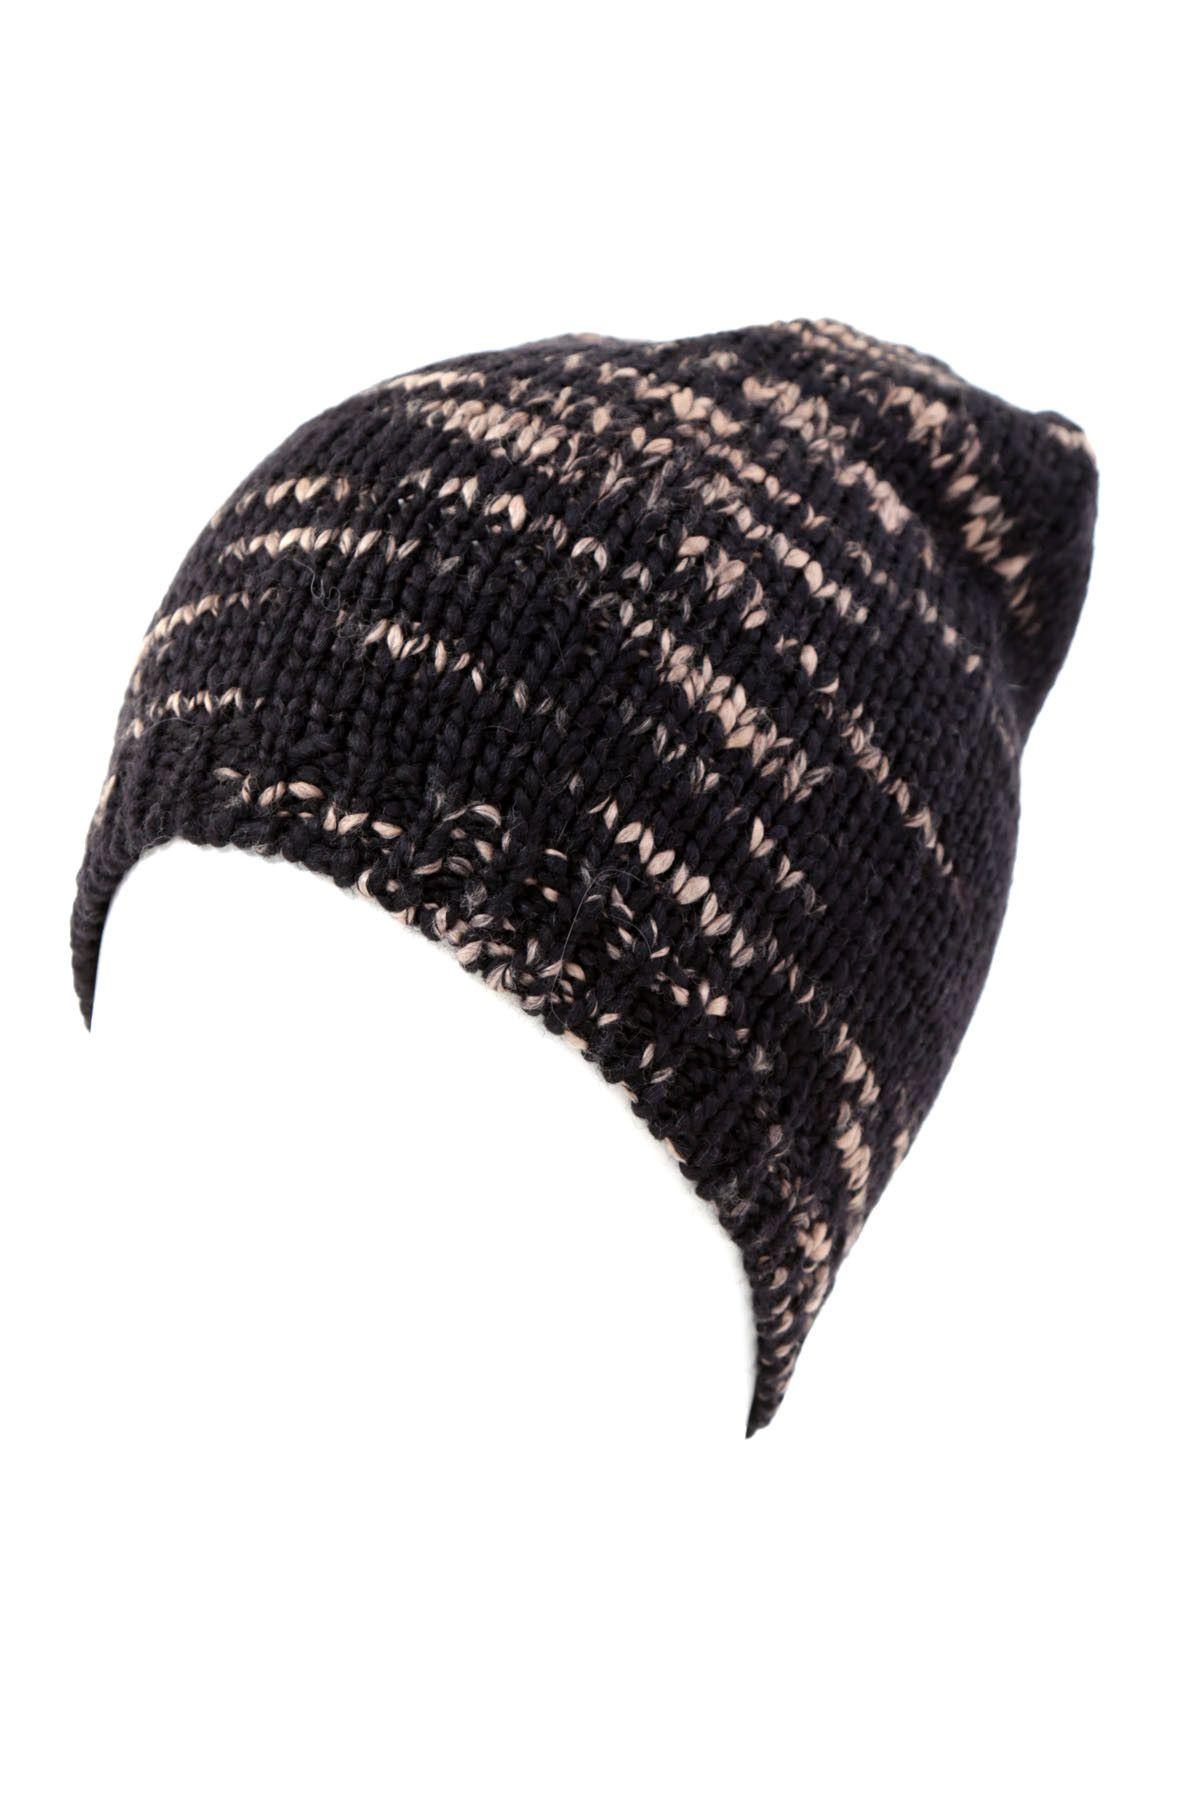 Ermanno Scervino Women's Cap In Black